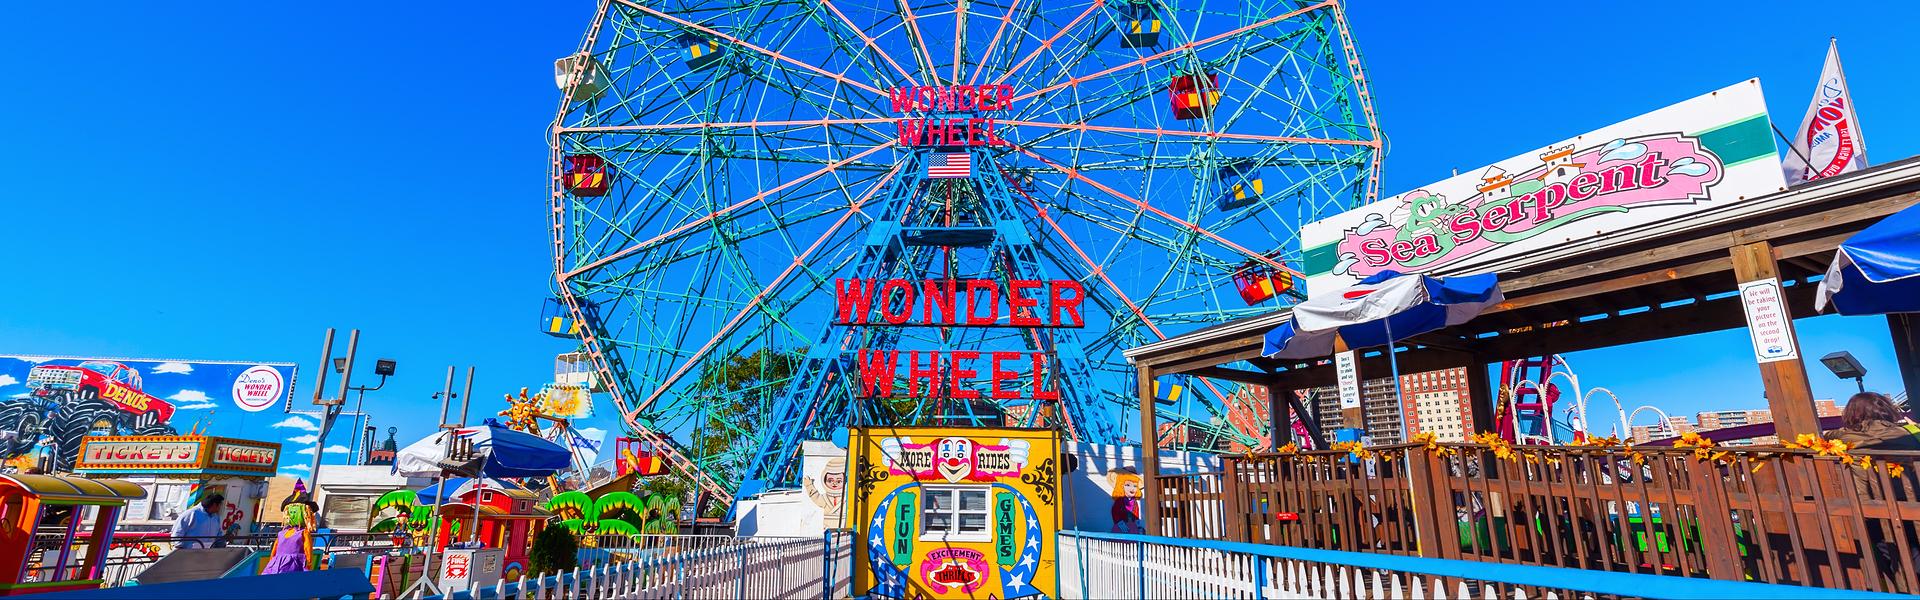 http://livingfreenyc.com/wp-content/uploads/2016/06/Coney-Island.jpg